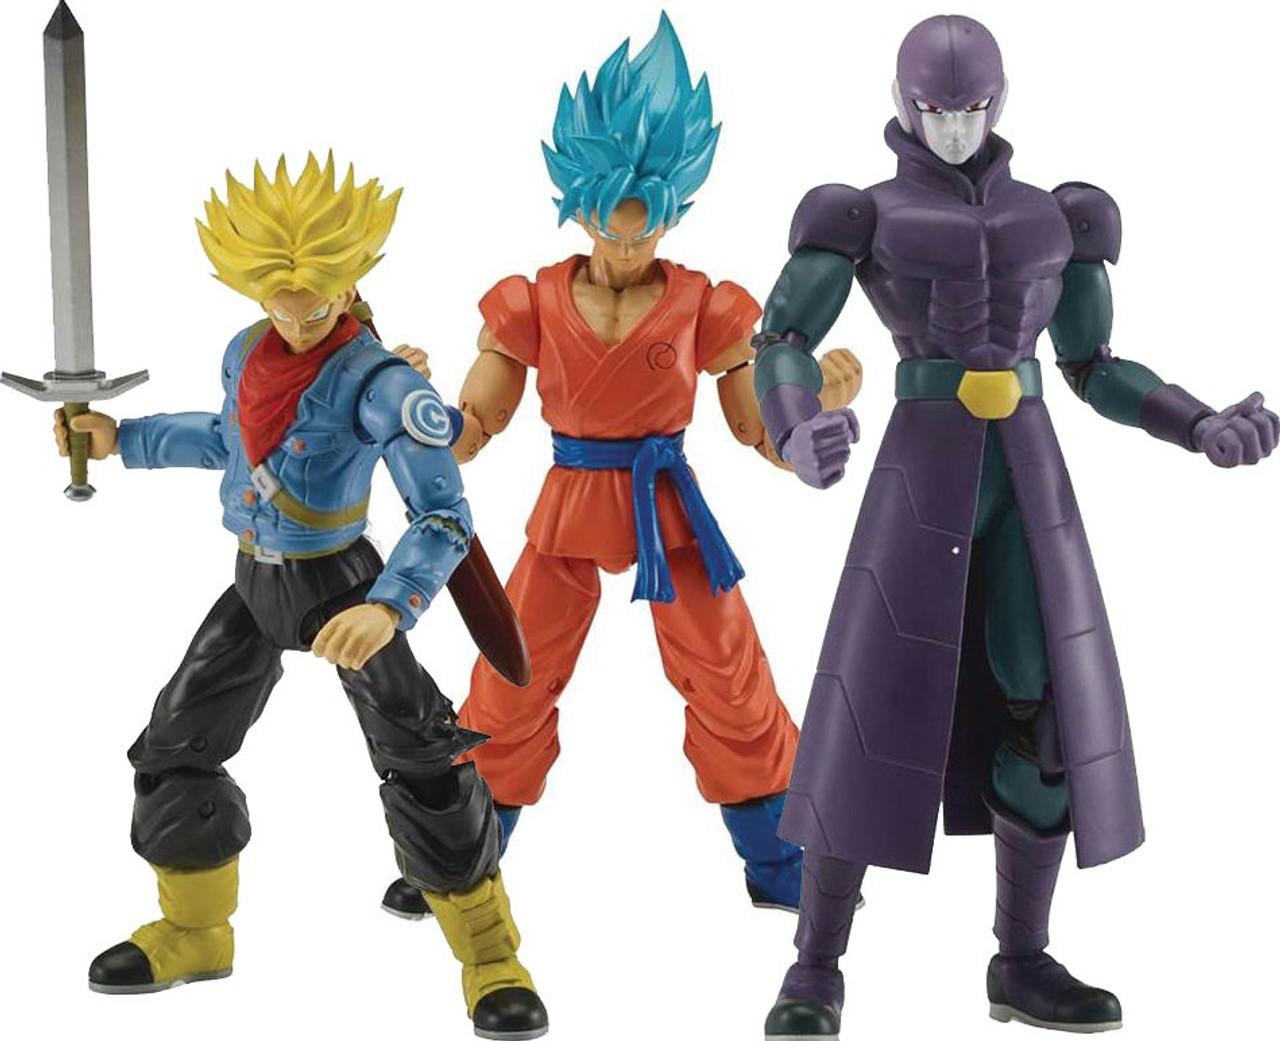 Dragon Ball Super Dragon Stars Series 3 Ssgss Goku Ss Future Trunks Hit Set Of 3 Action Figures Fusion Zamasu Build A Figure